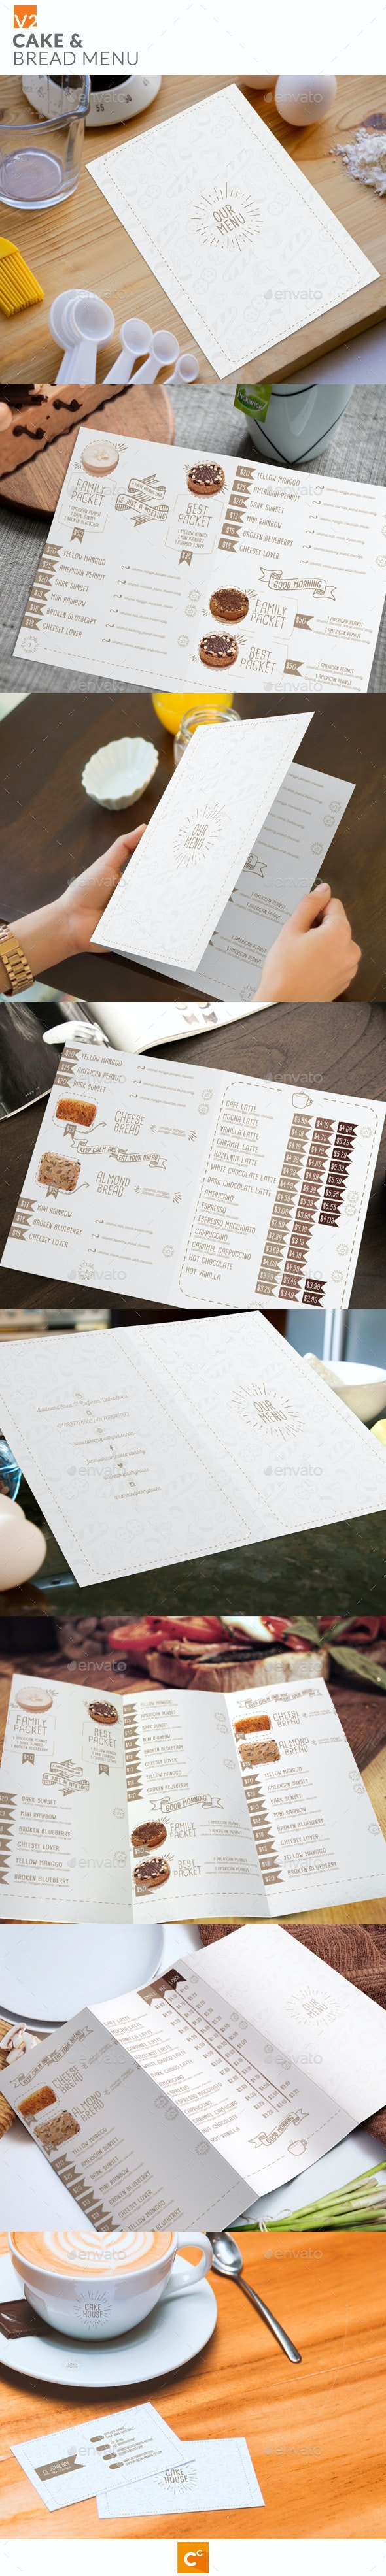 Cake & Bread Menu v2 - Food Menus Print Templates